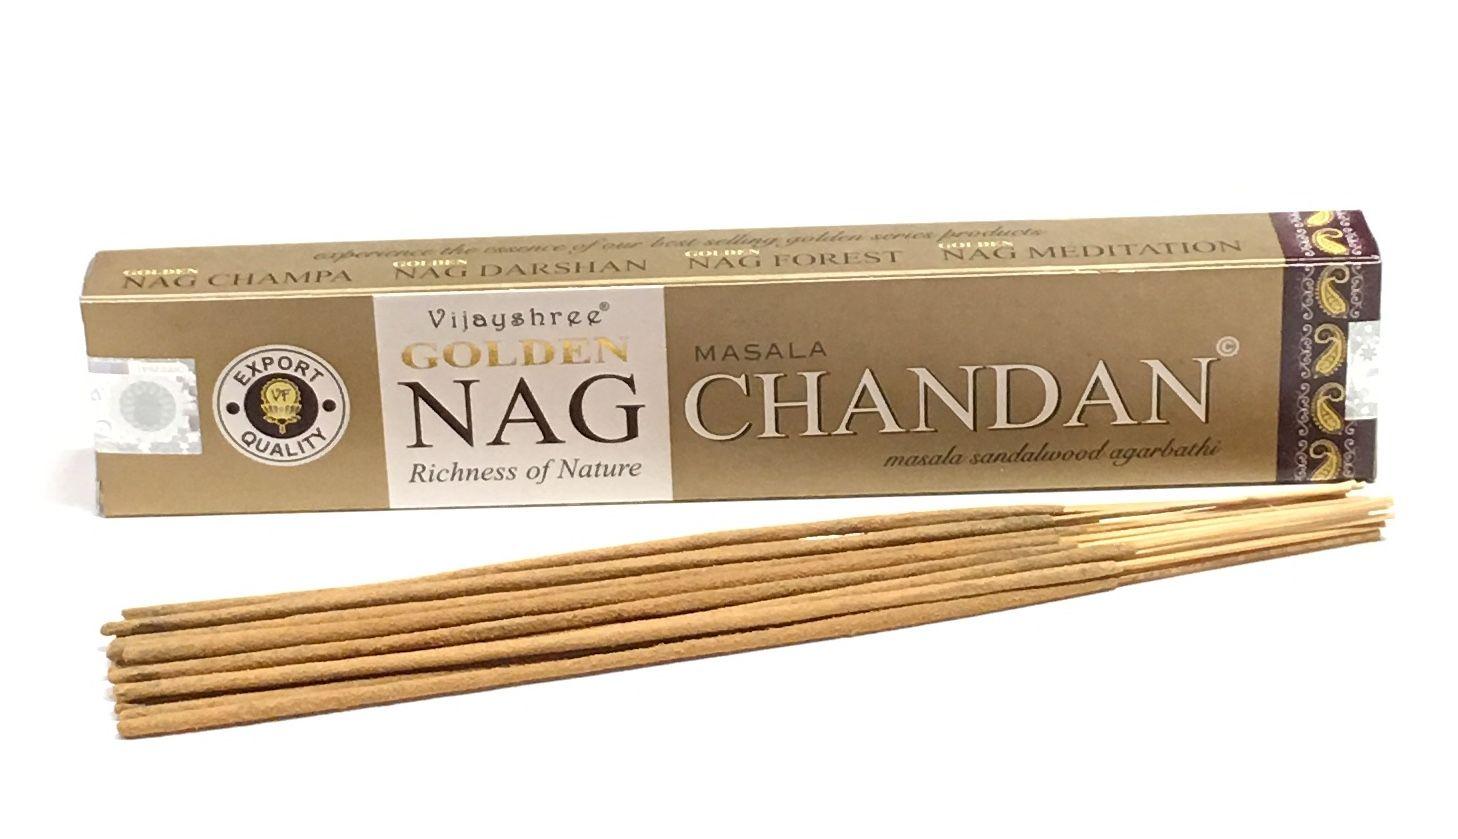 Incienso NAG CHANDAN GOLDEN  (15 g aprox. 15 sticks)